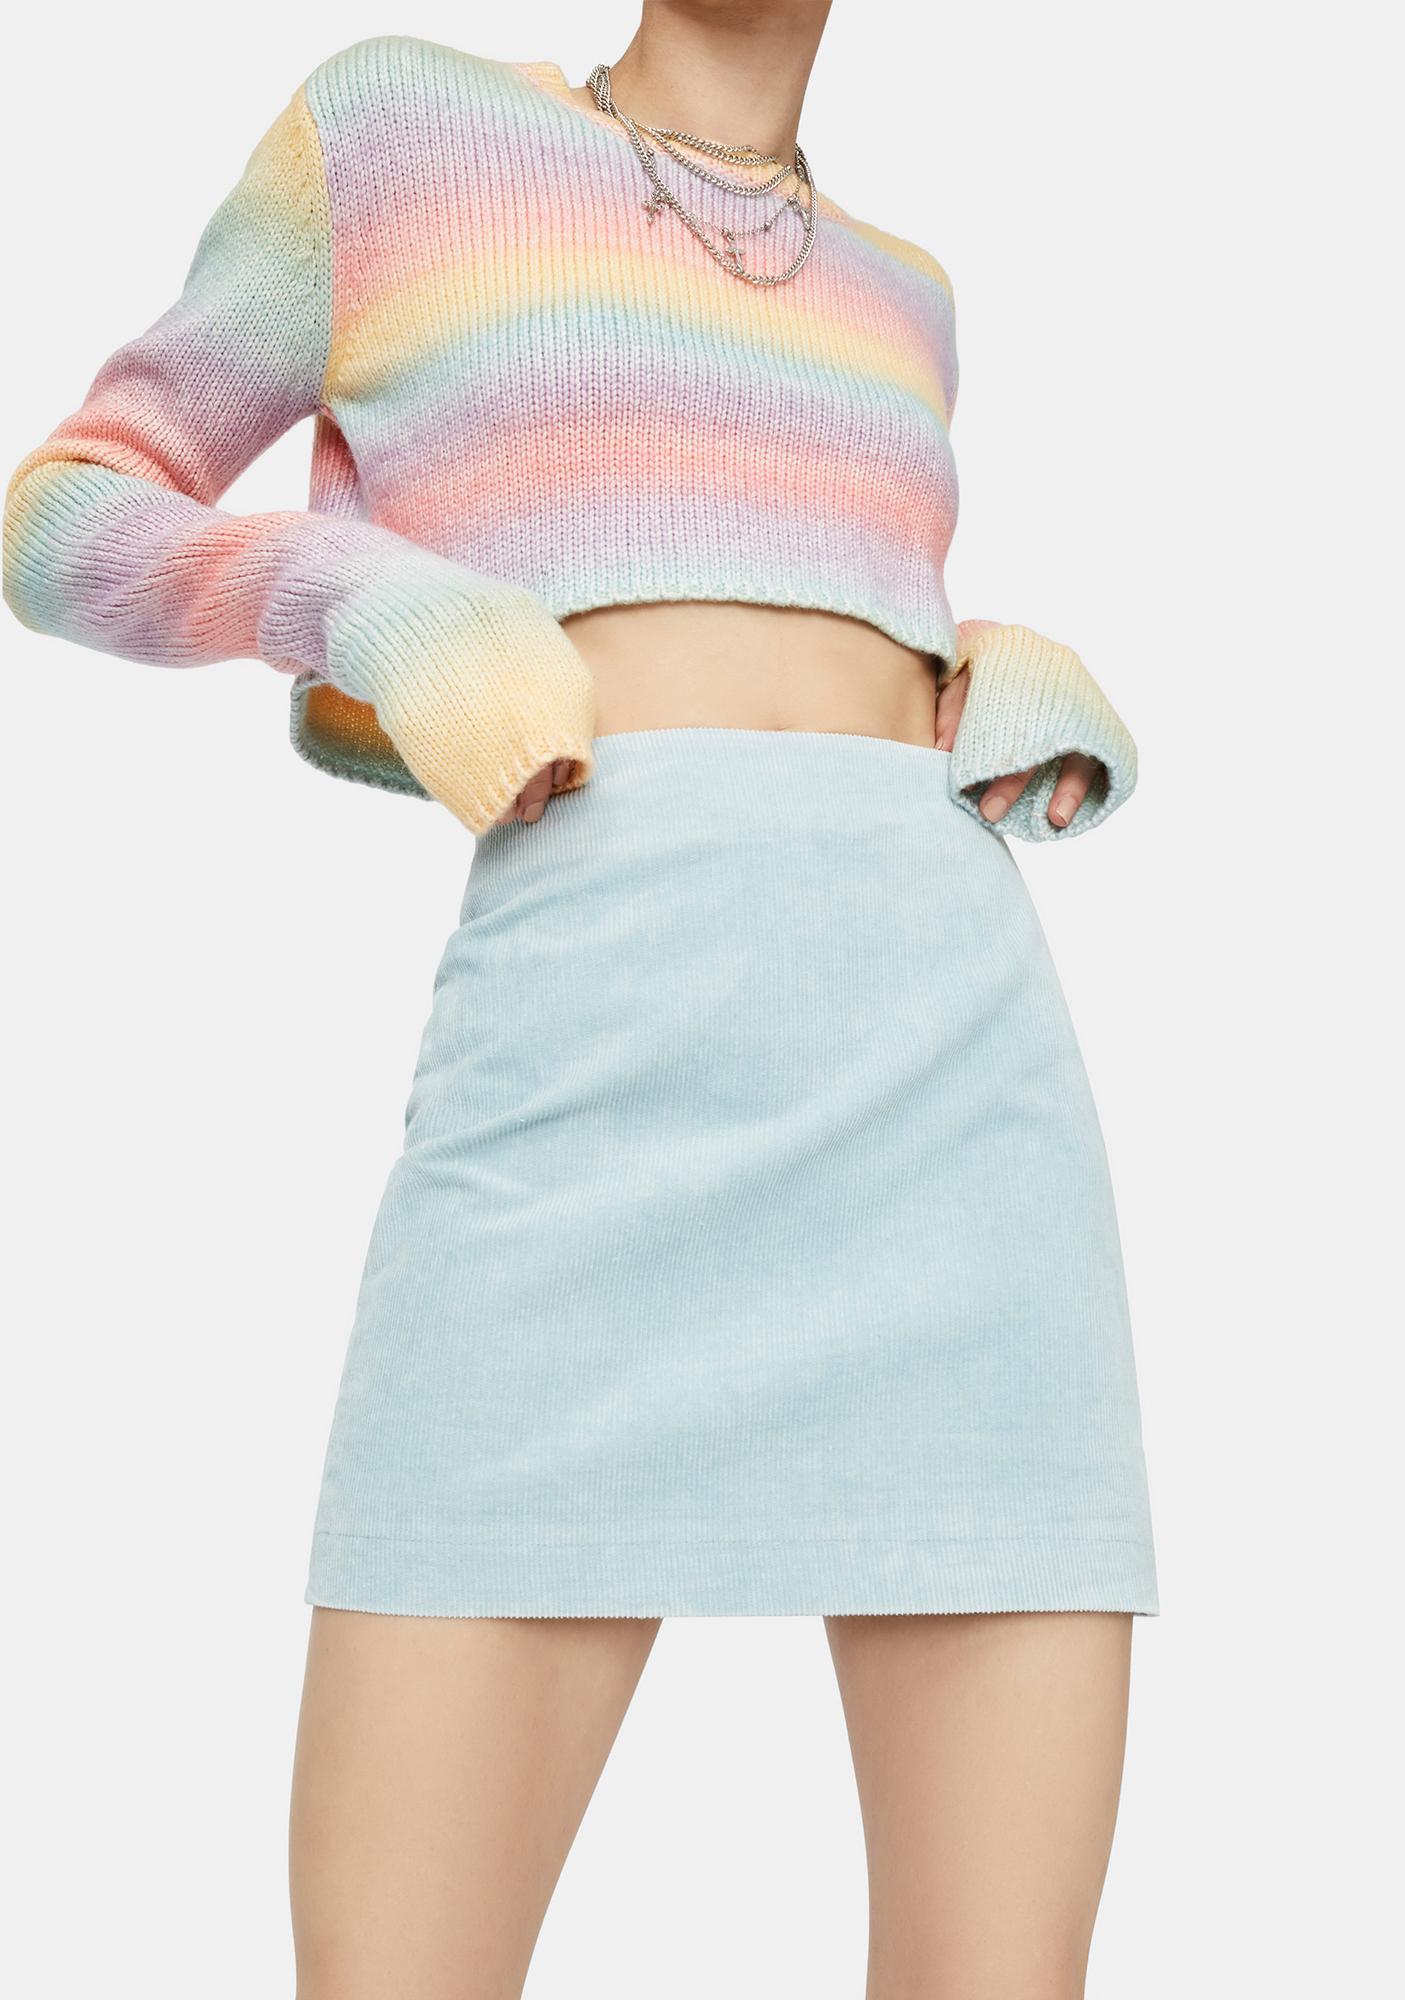 Sky's The Limit Corduroy Mini Skirt